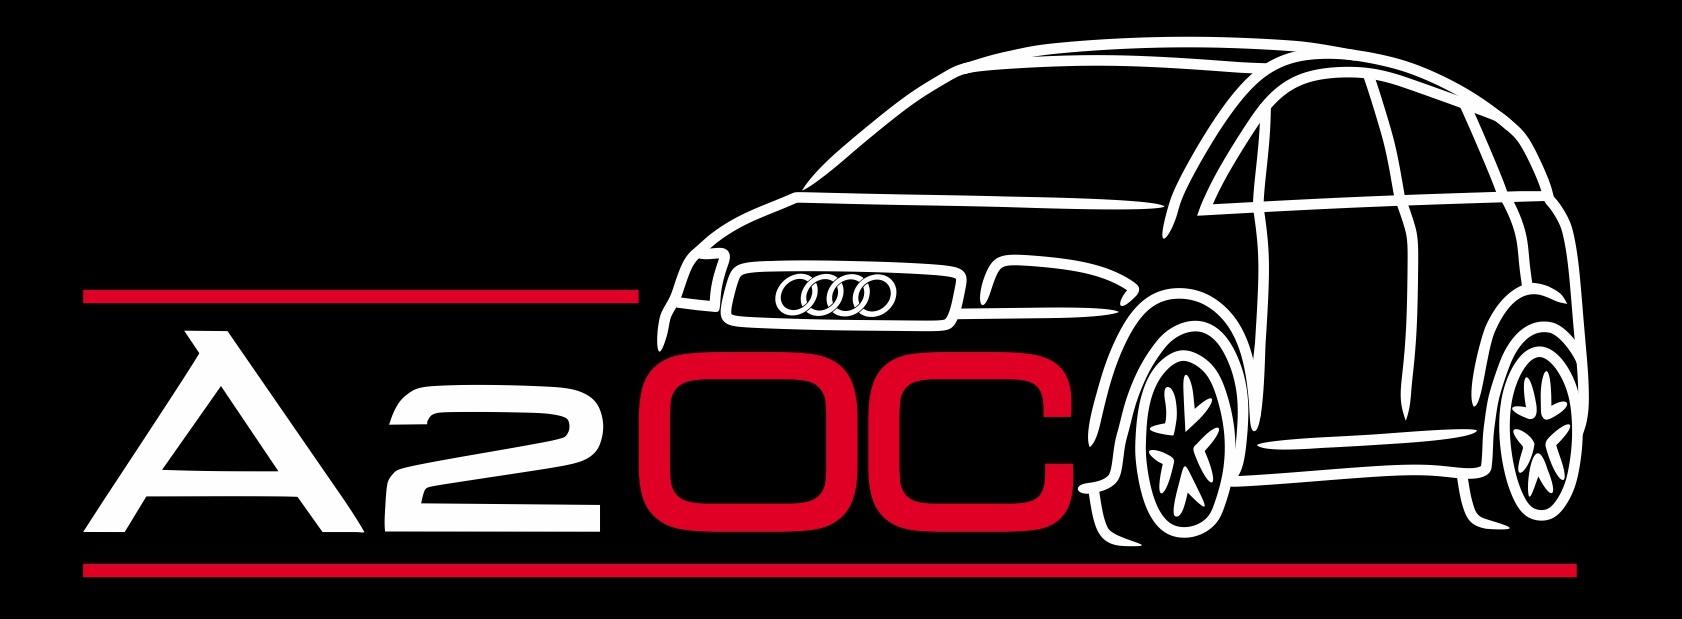 Audi_A2_logo_2.jpg